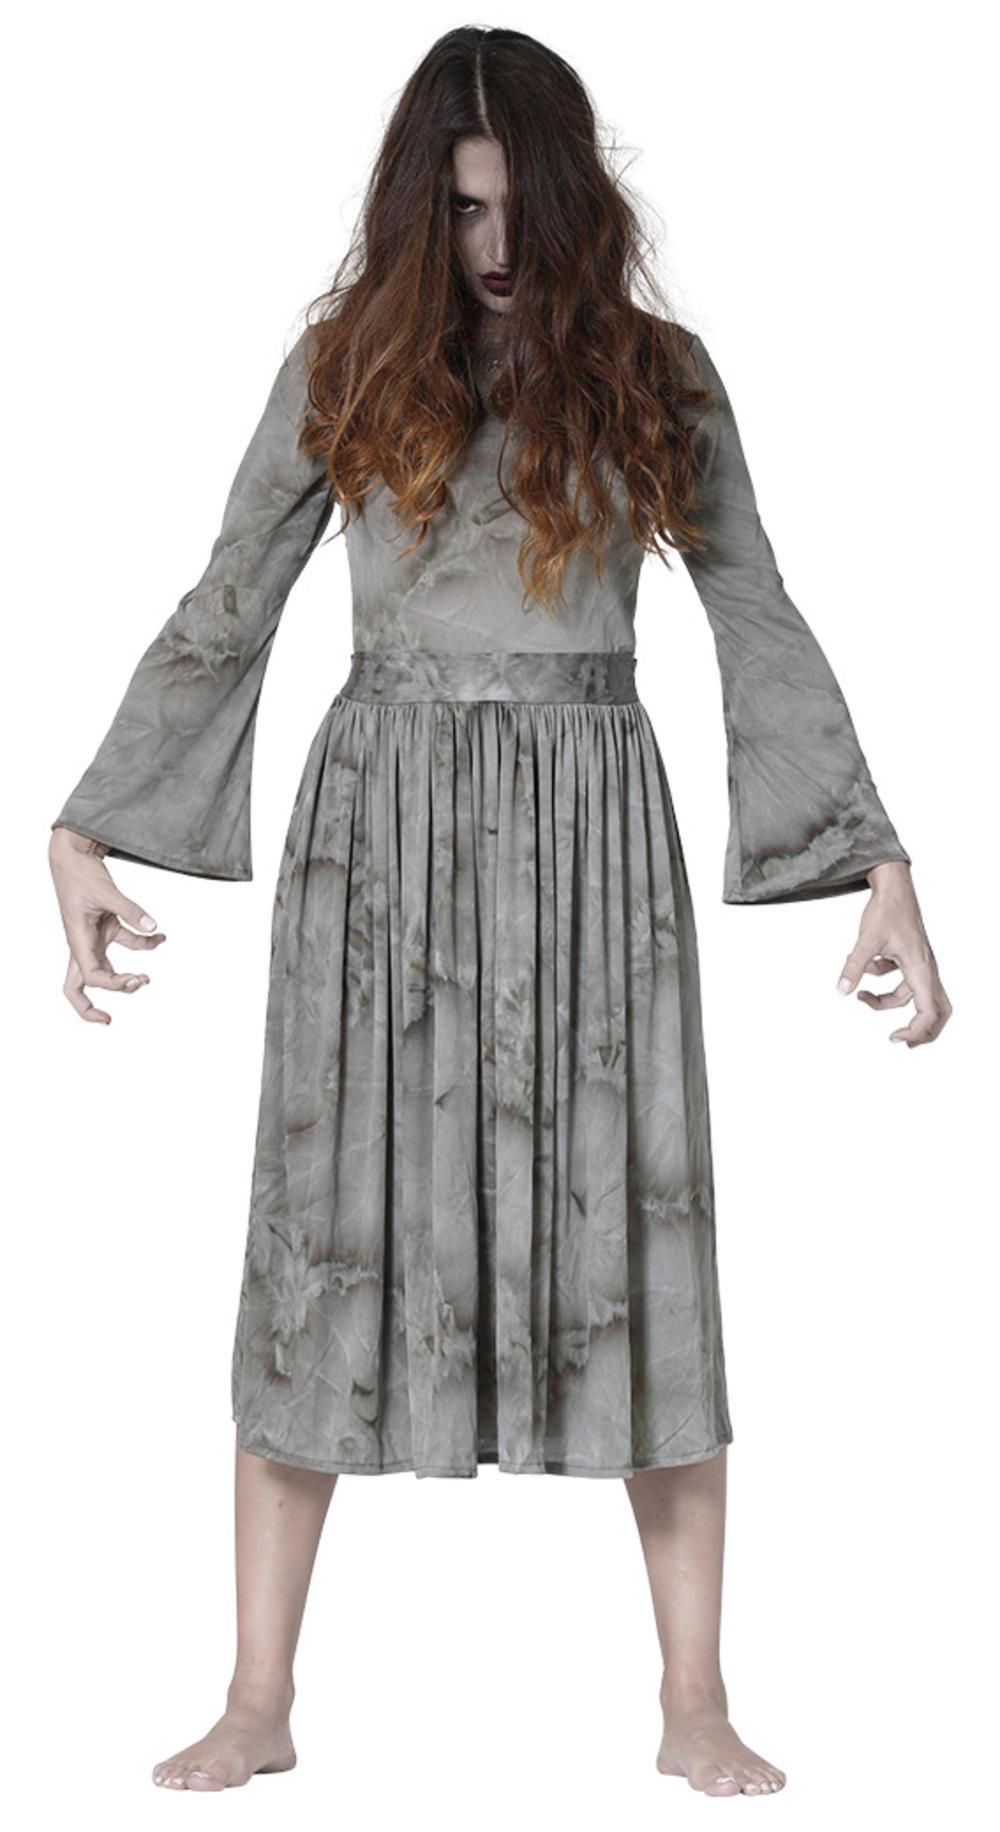 Ladies Possessed Phantom Costume